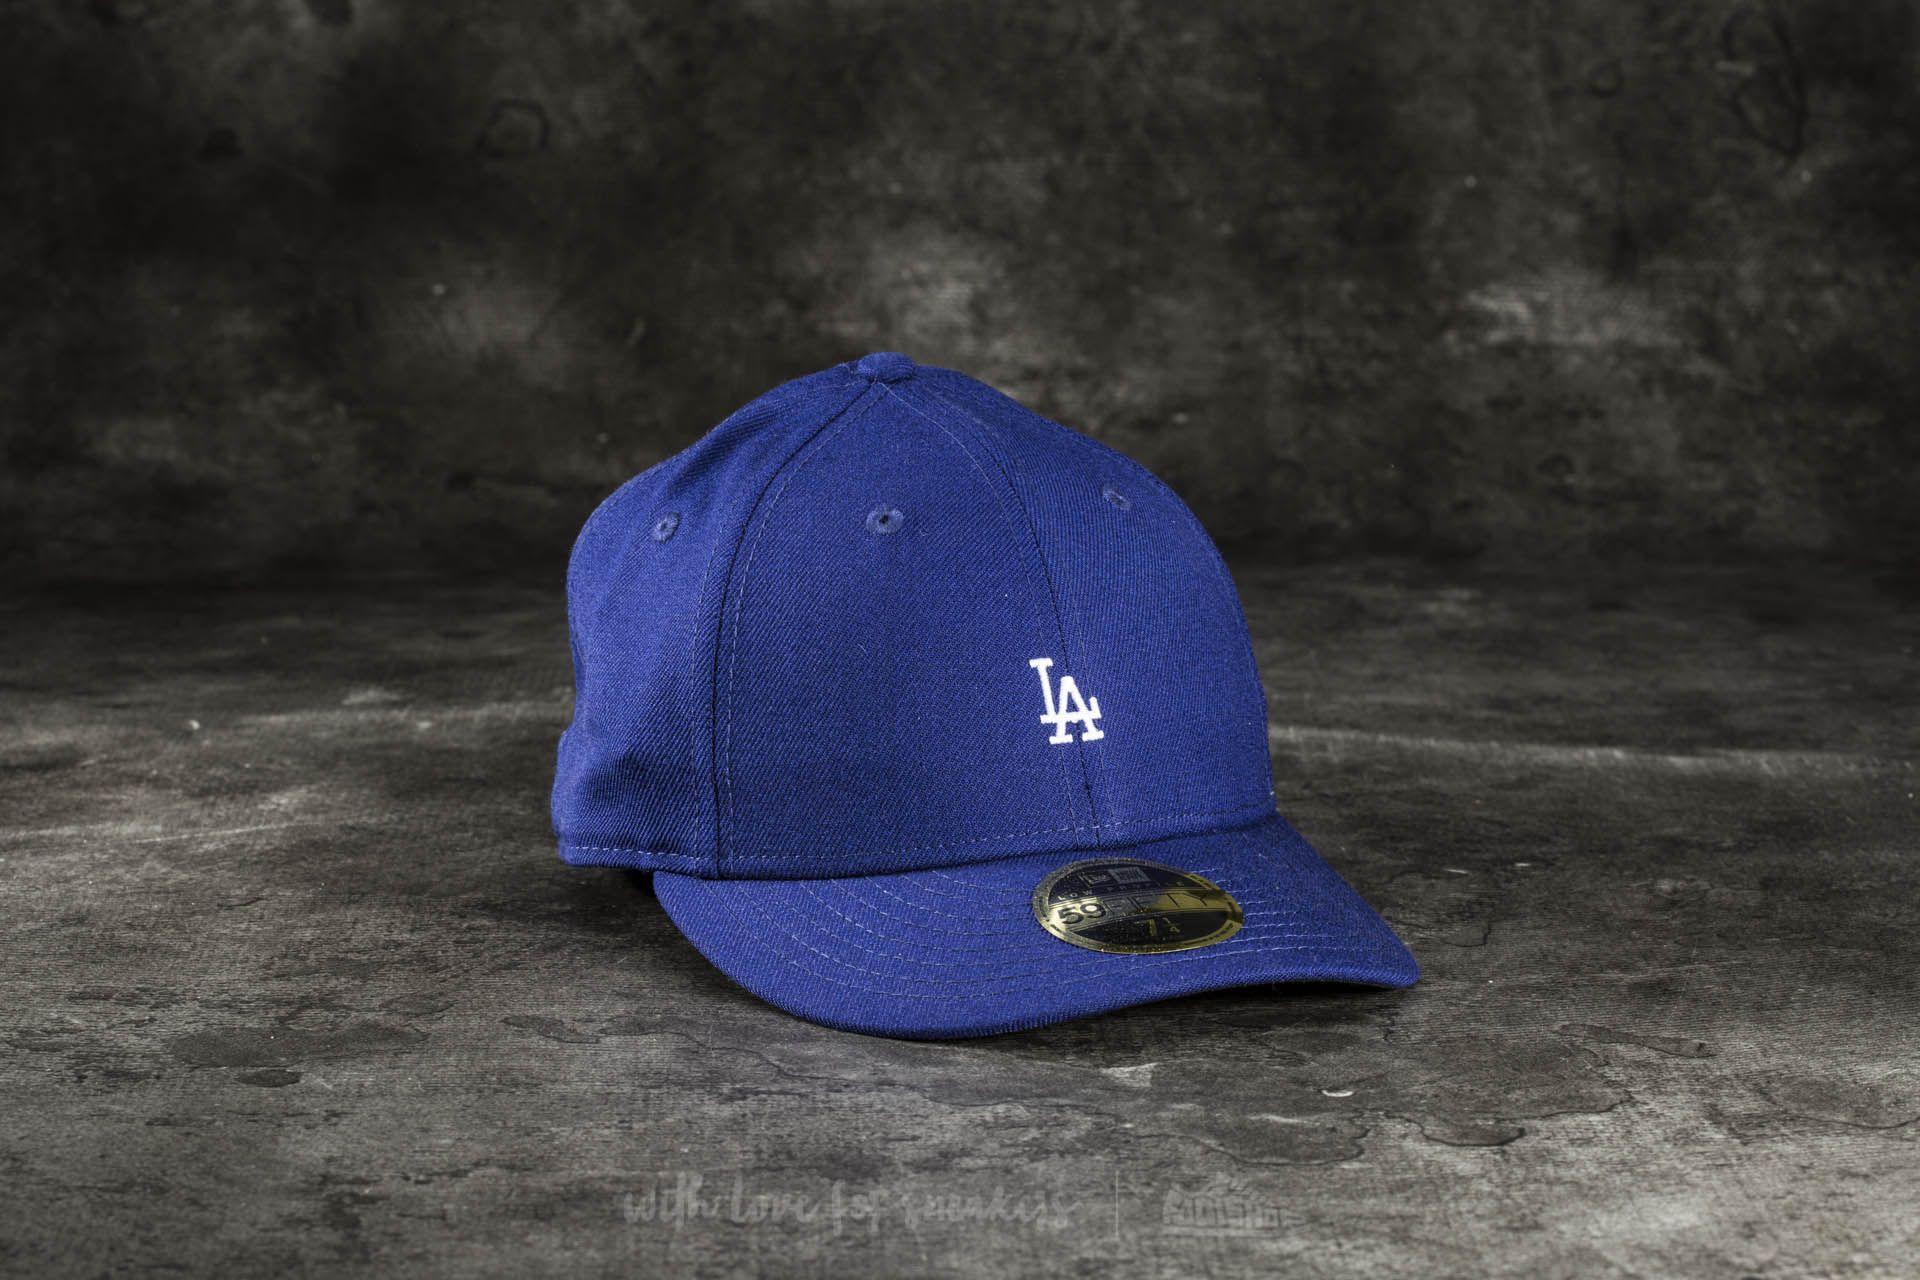 2d78e2b5773 New Era 59Fifty Low Profile Mini Logo Los Angeles Dodgers Cap Blue at a  great price